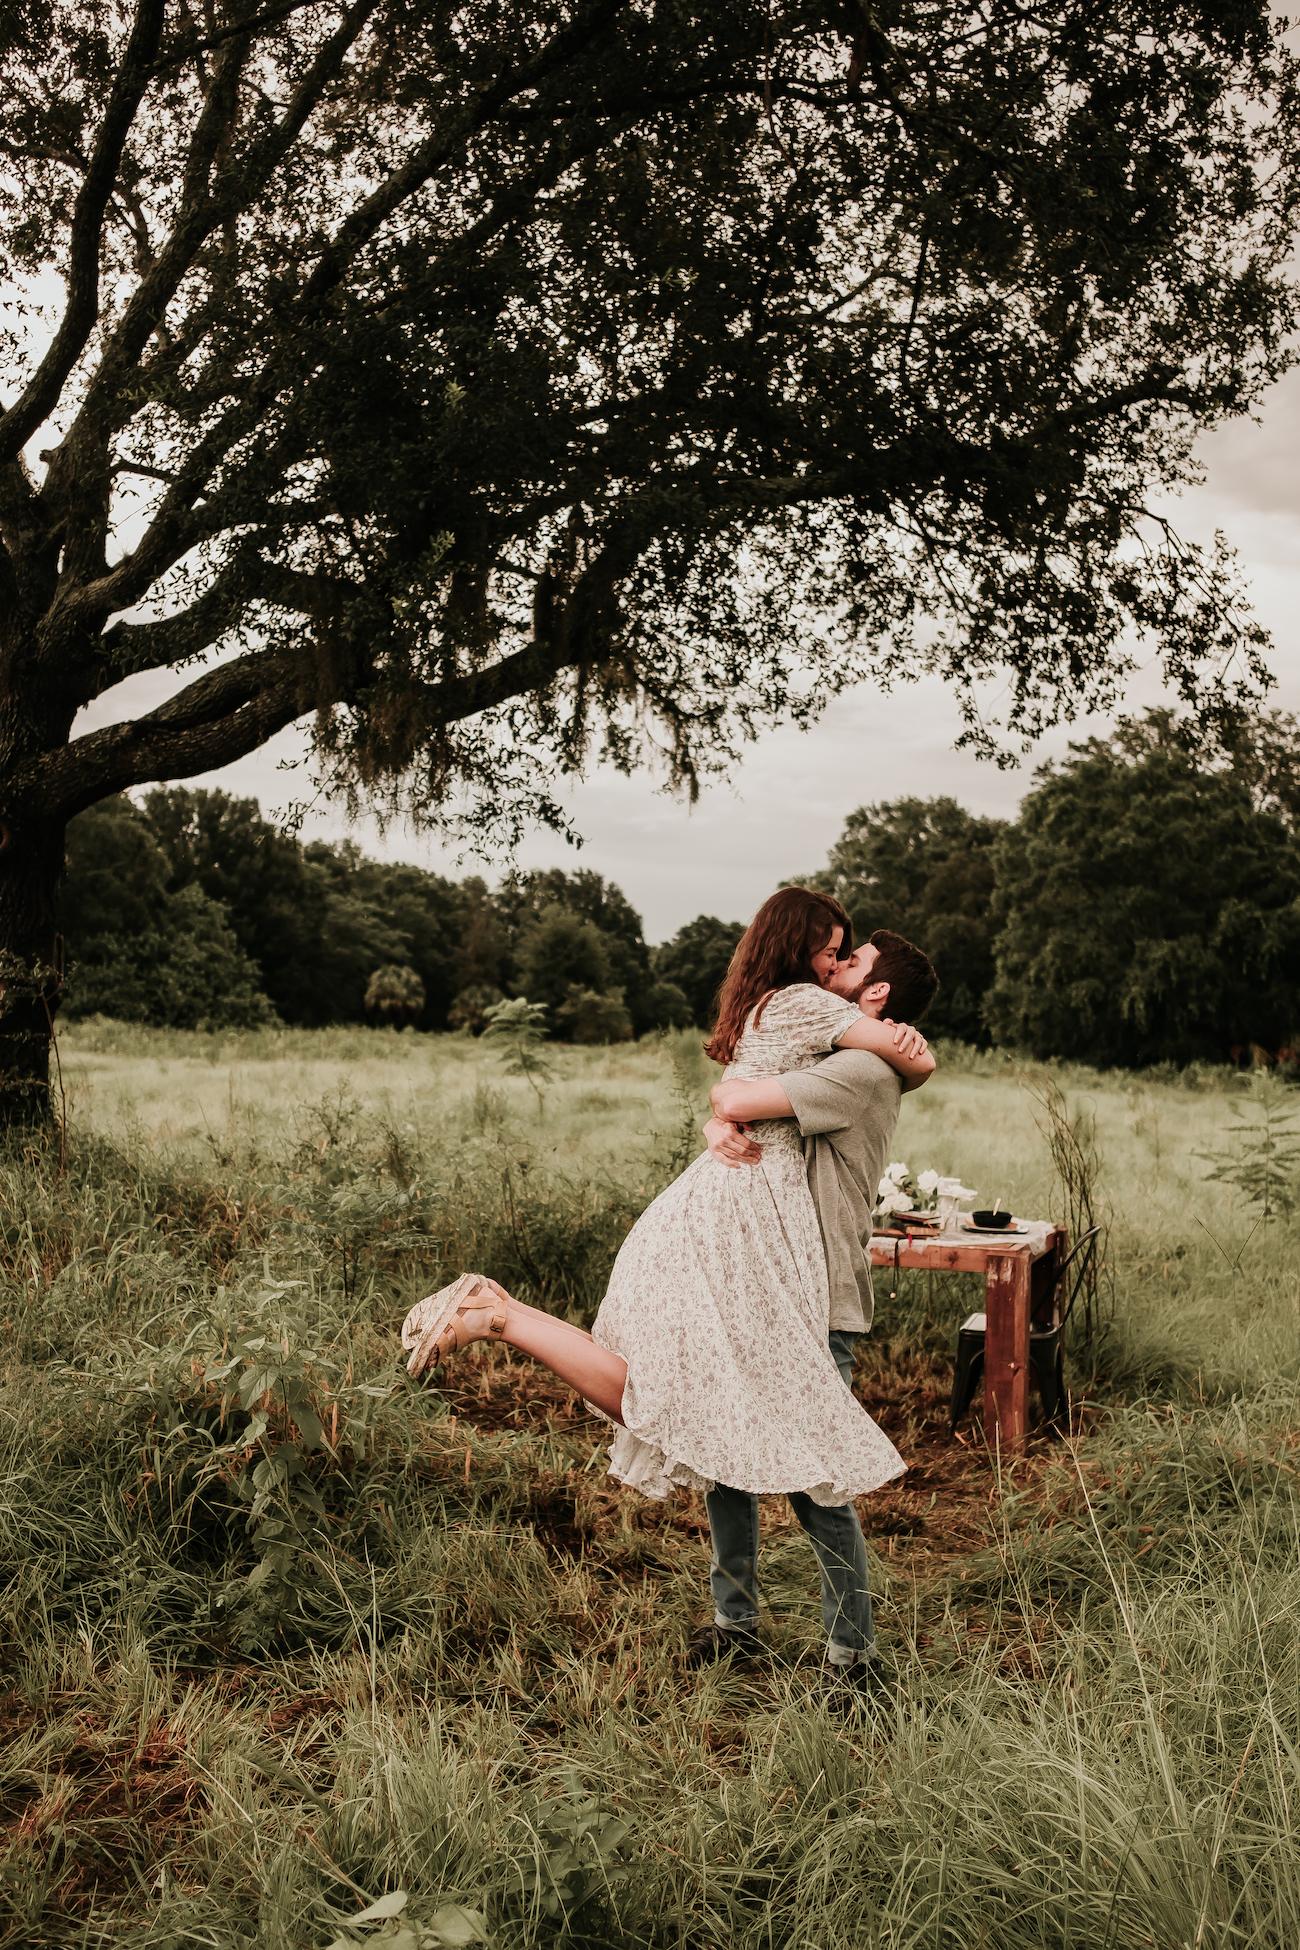 tampa-engagement-proposal-photography-119.jpeg